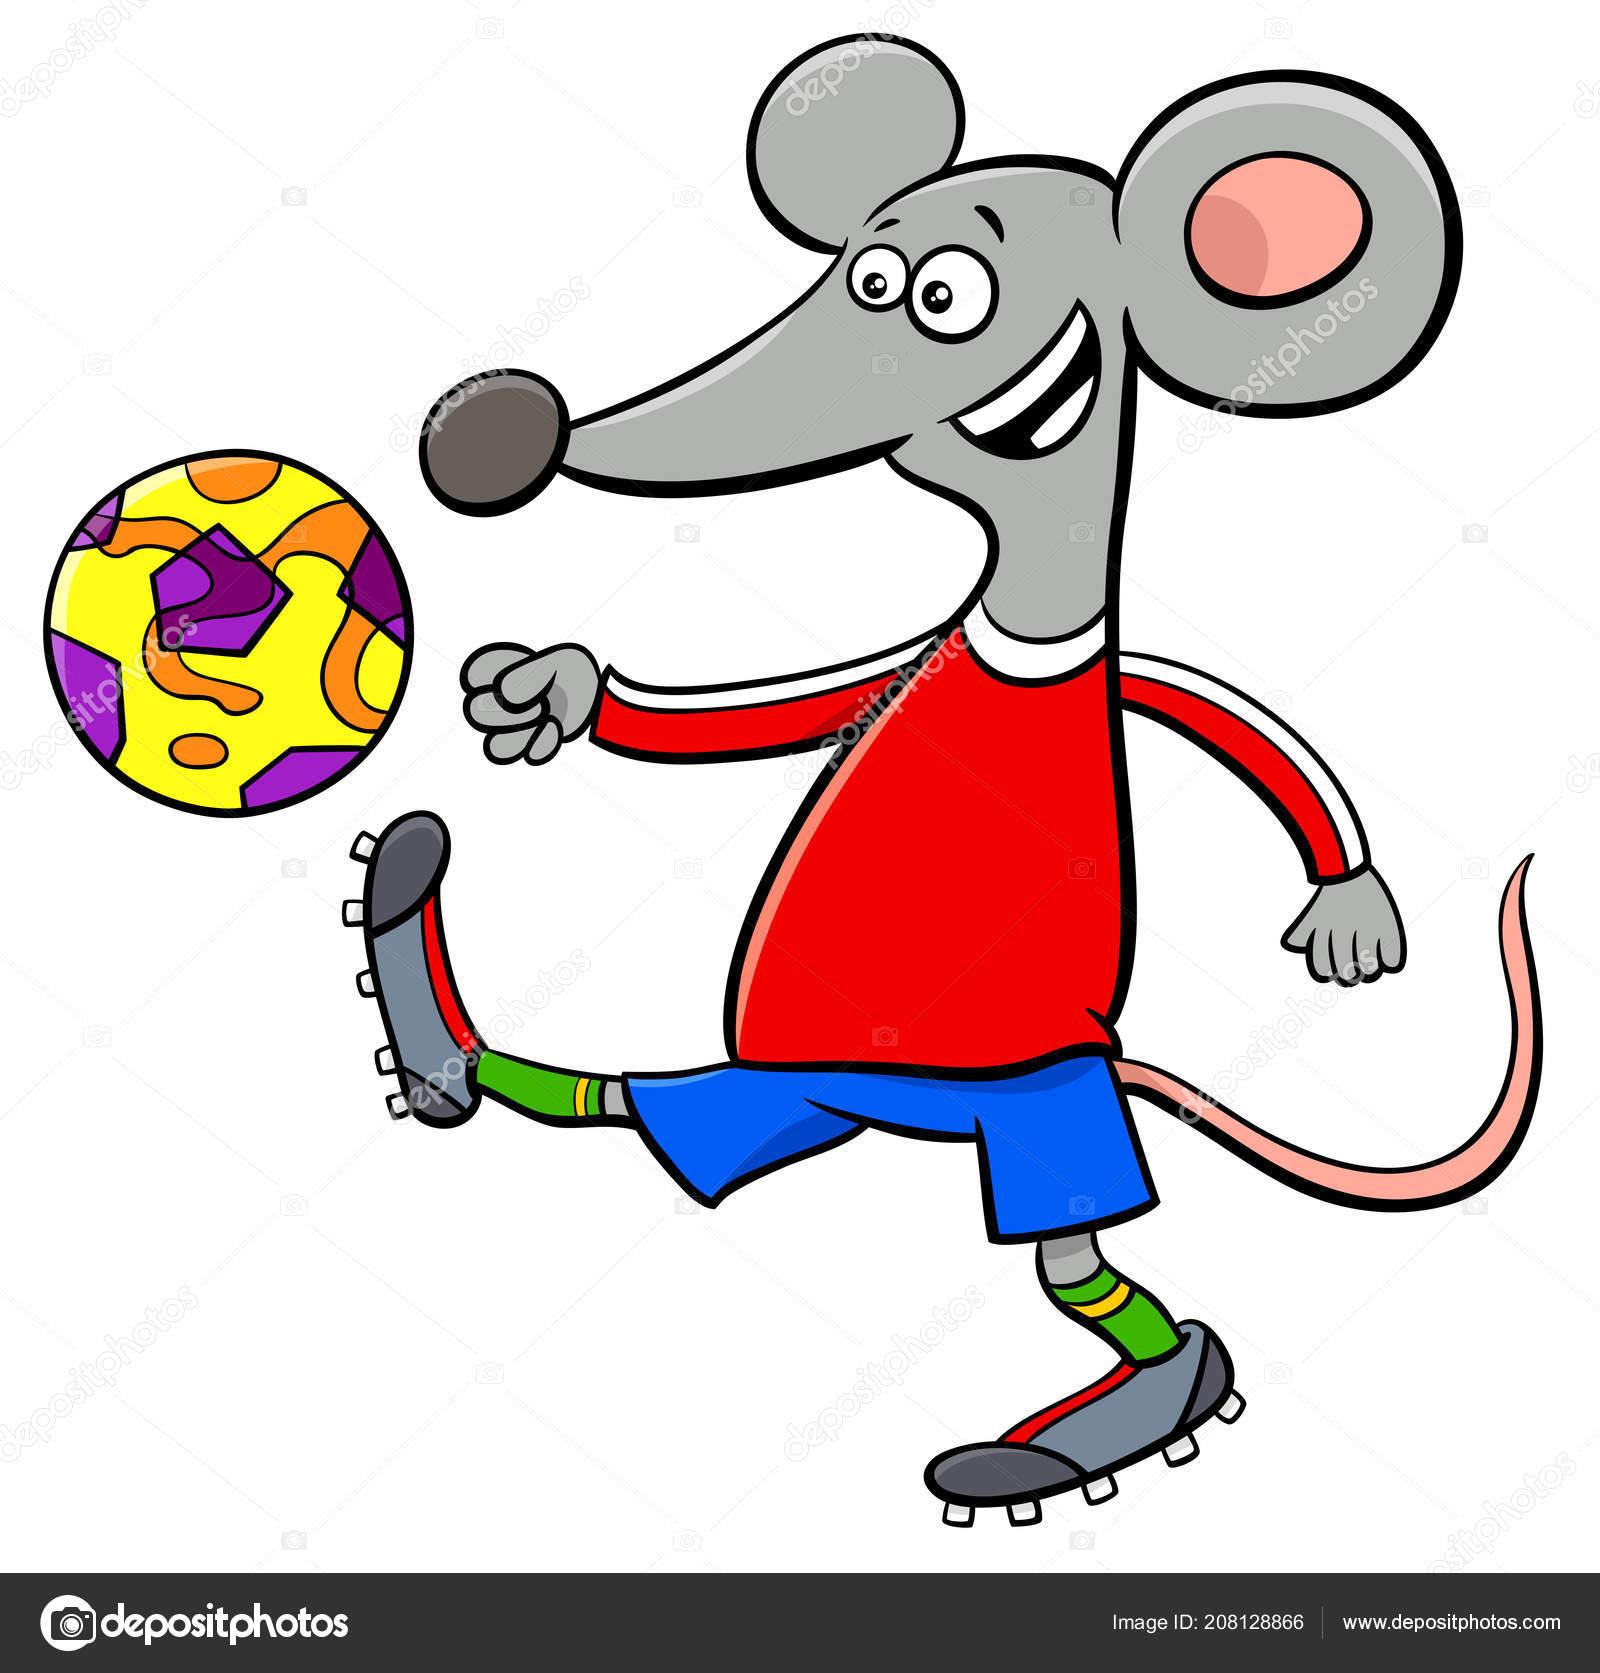 Cartoon Illustrationen Der Maus Fussball Oder Fussball Spieler